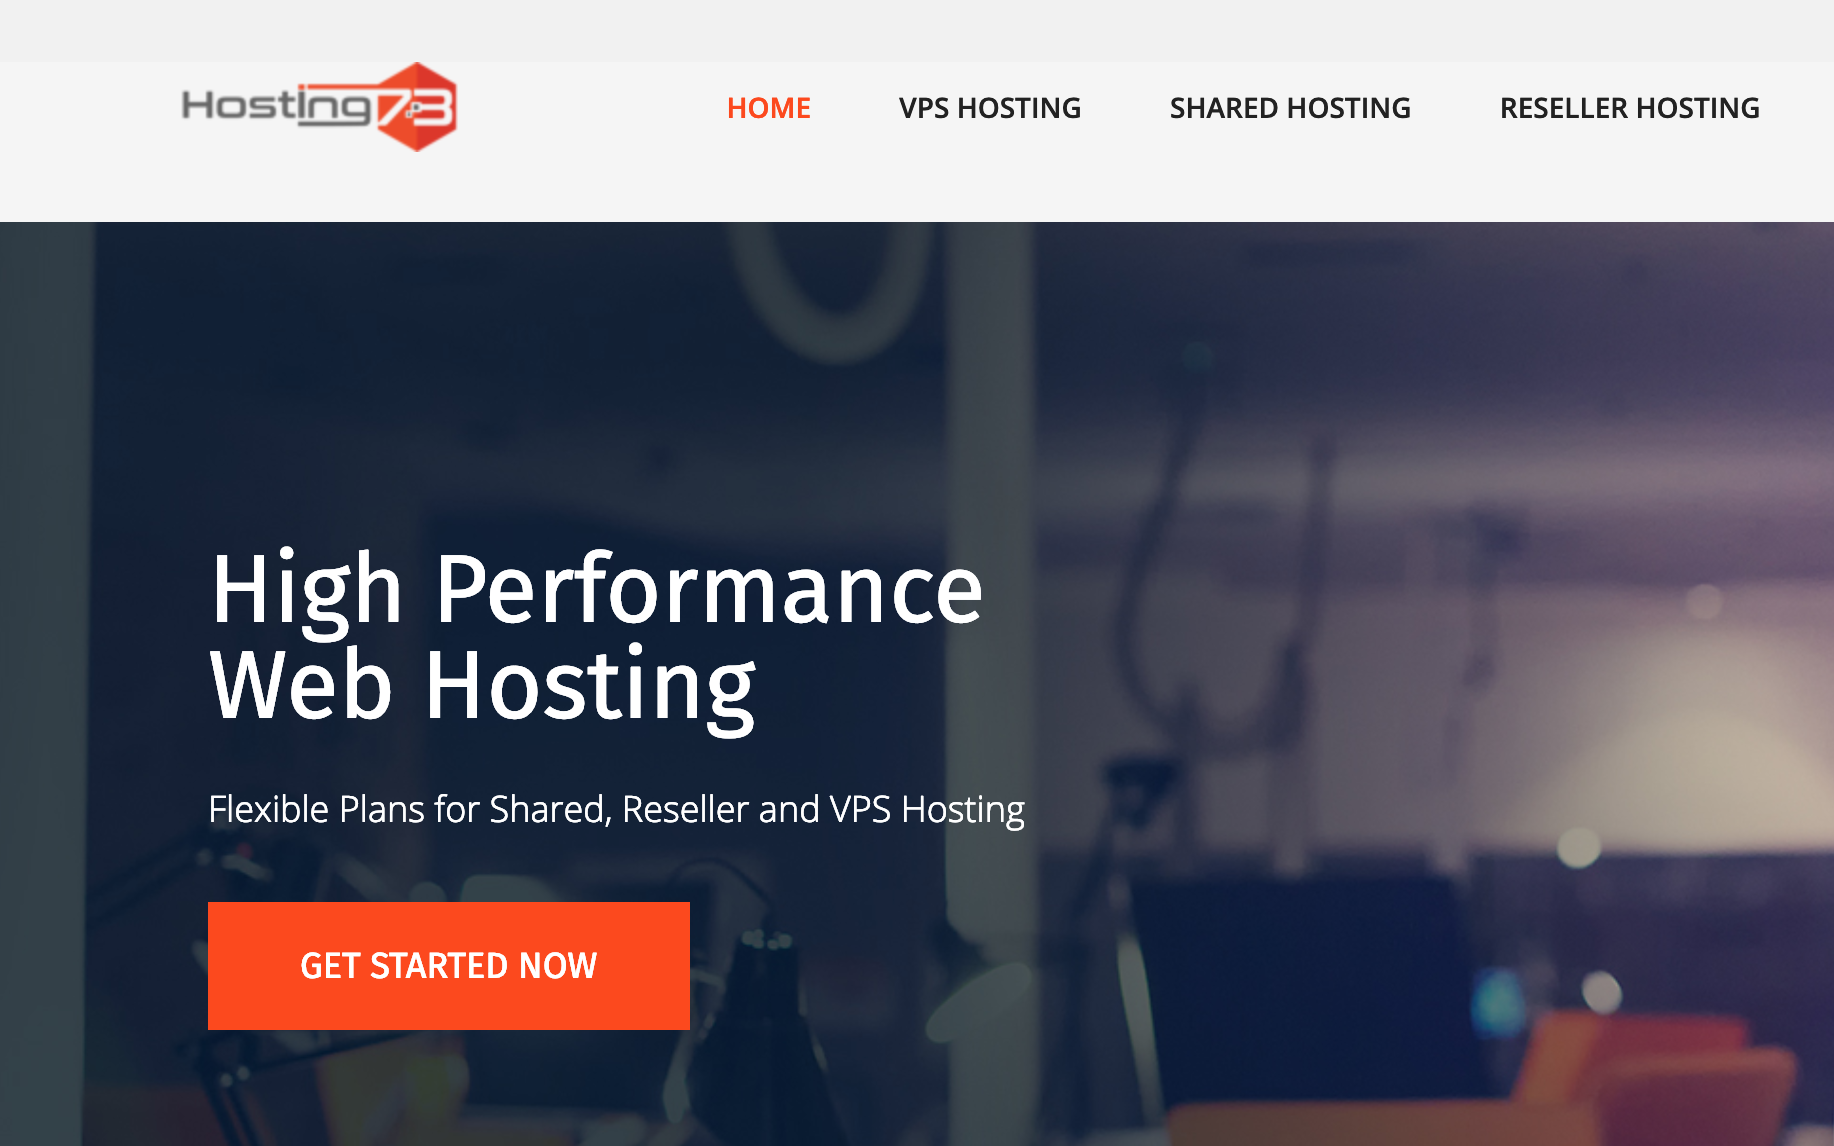 Hosting73 - 年付14美元1.5GB SSD VPS,3GB SSD VPS年付25美元,纽约布法罗(水牛城)数据中心,Hosting73优惠码